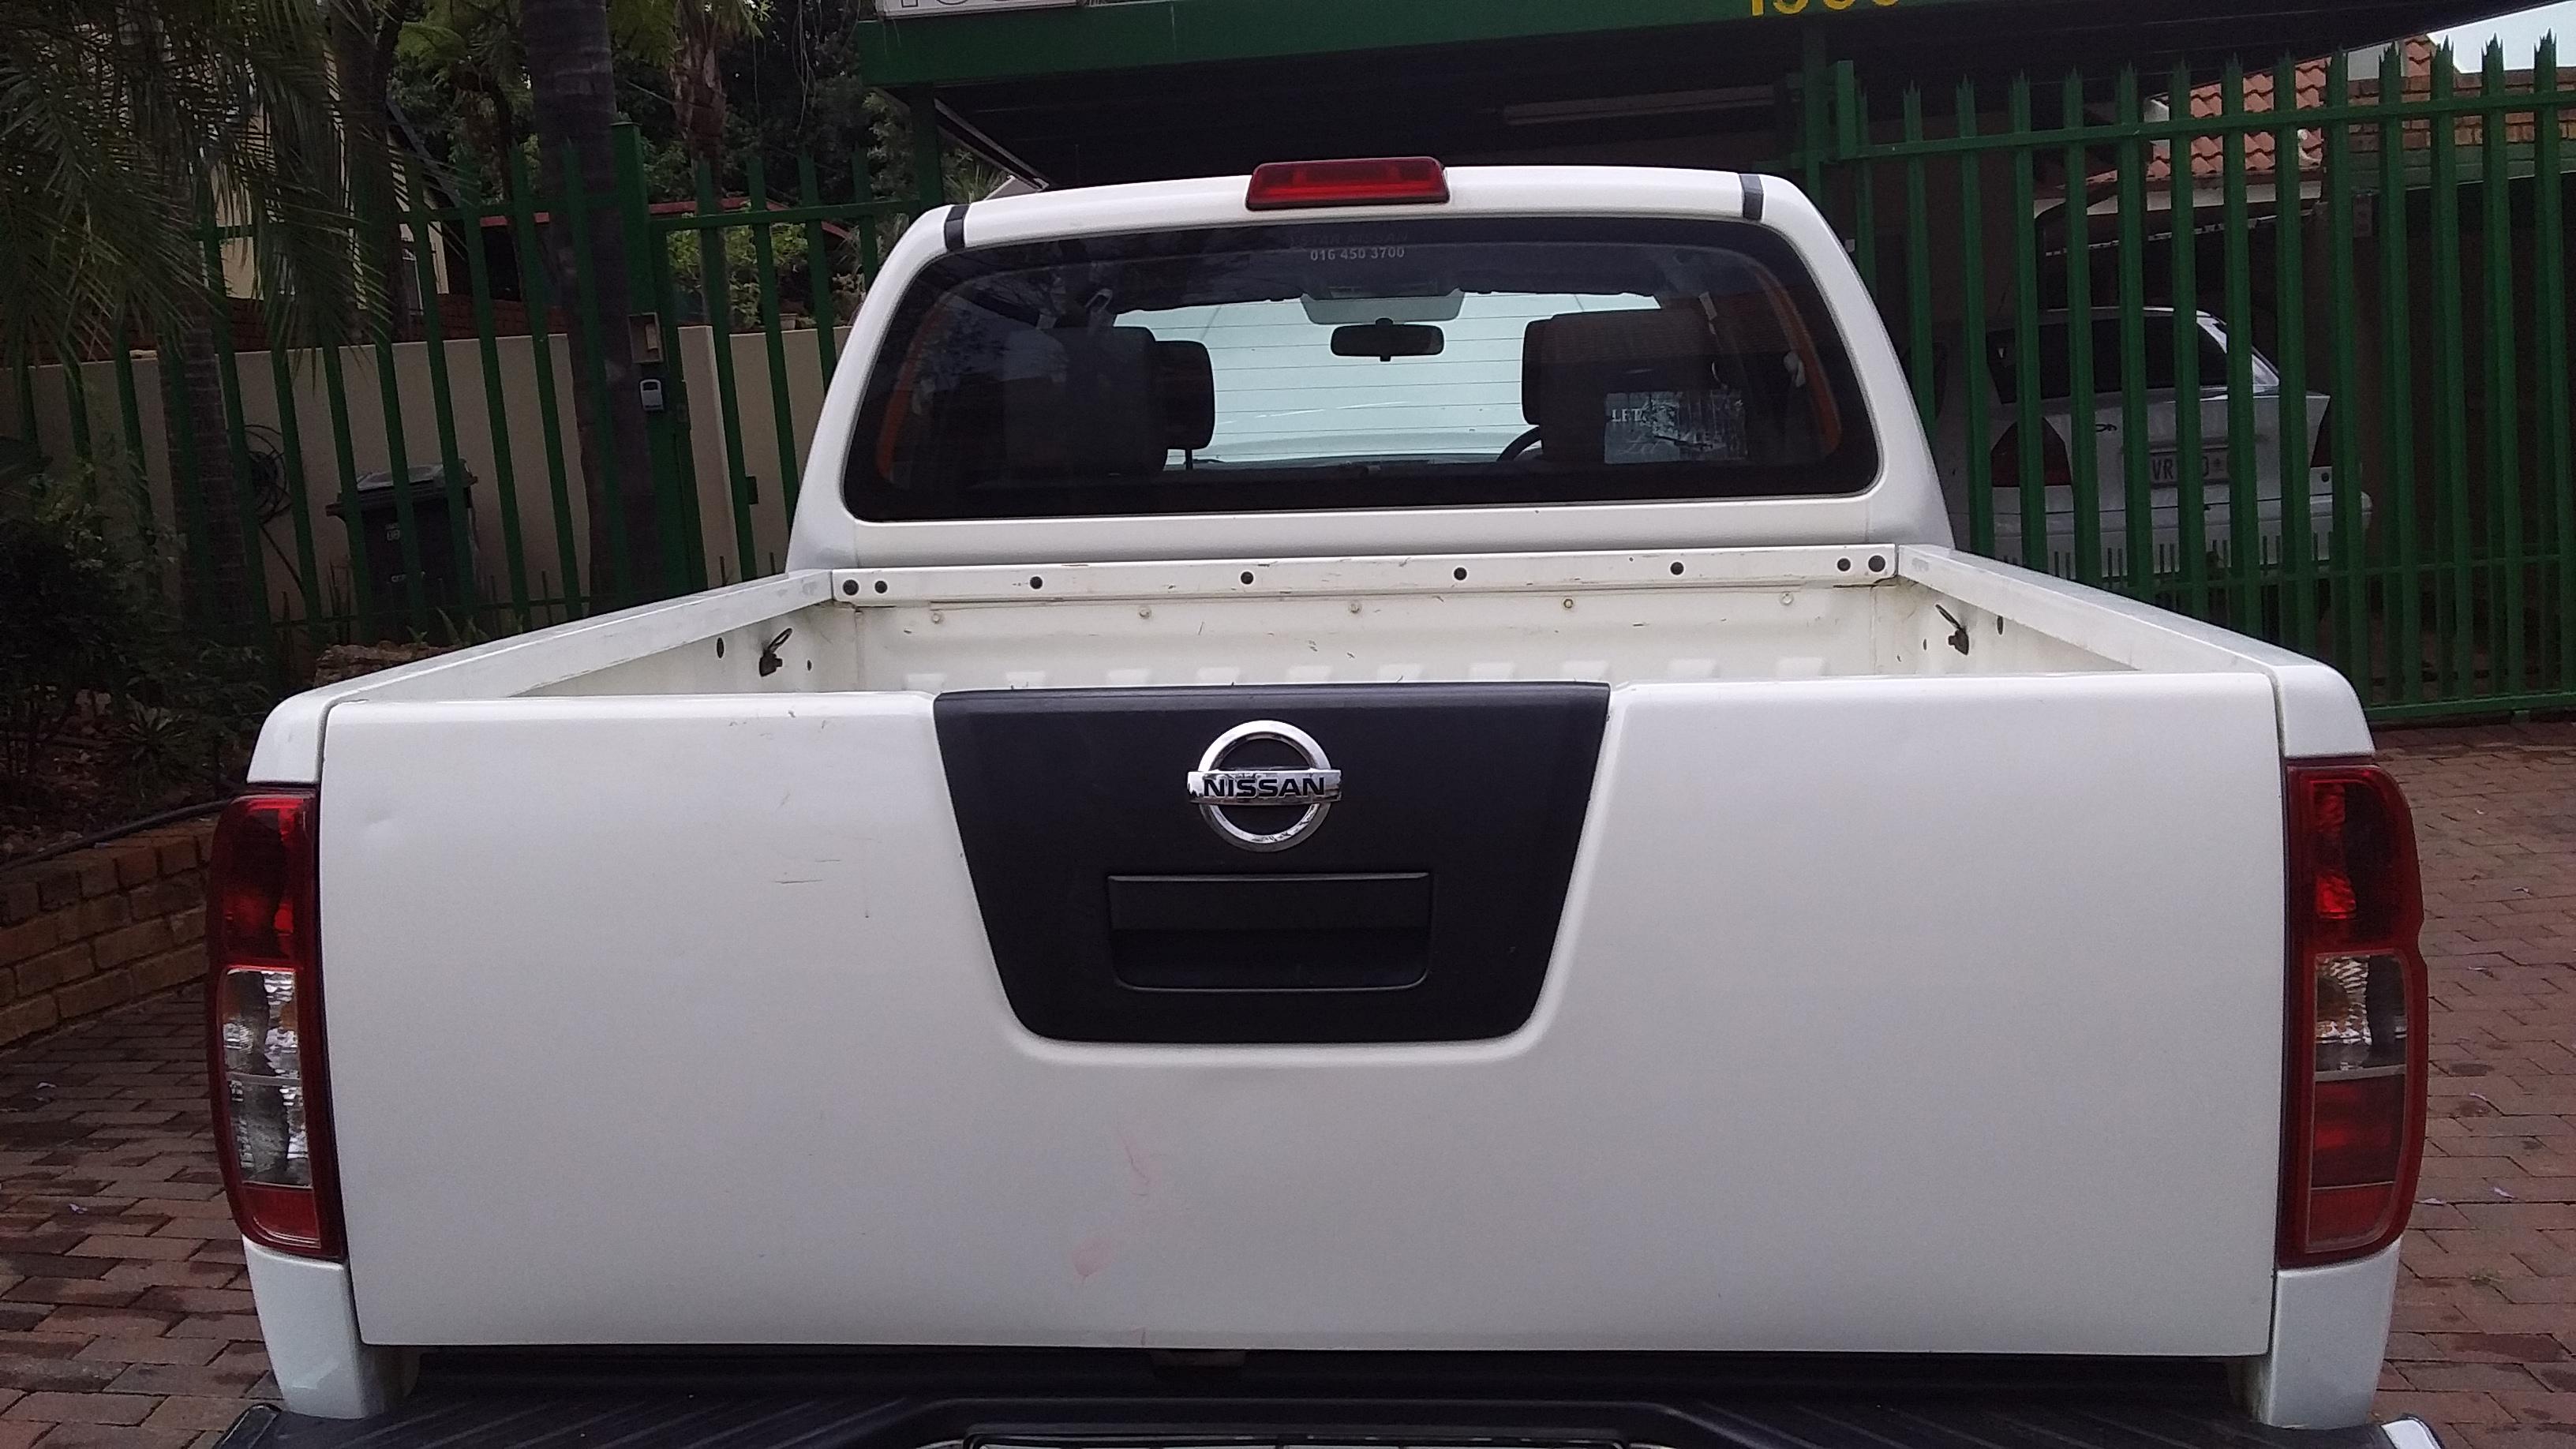 2014 Nissan Navara double cab bakkie with diesel 2 5 6 Speed